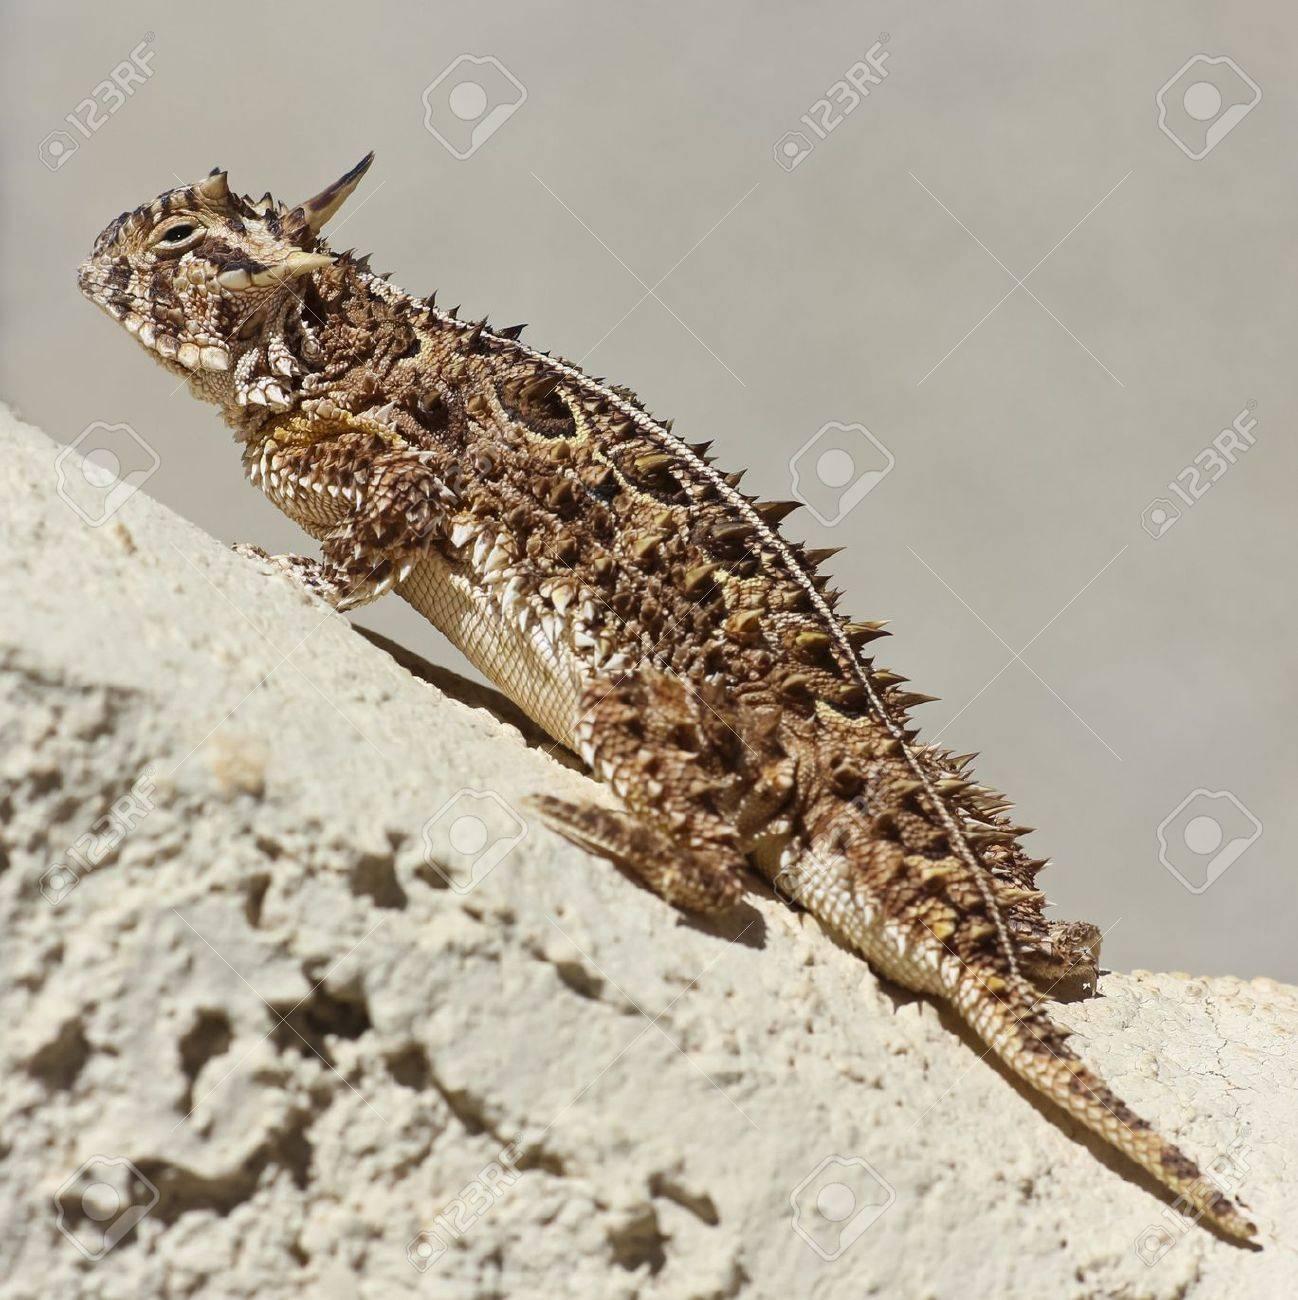 A Close Up of a Texas Horned Lizard Climbing on a Stucco Wall - 13991517